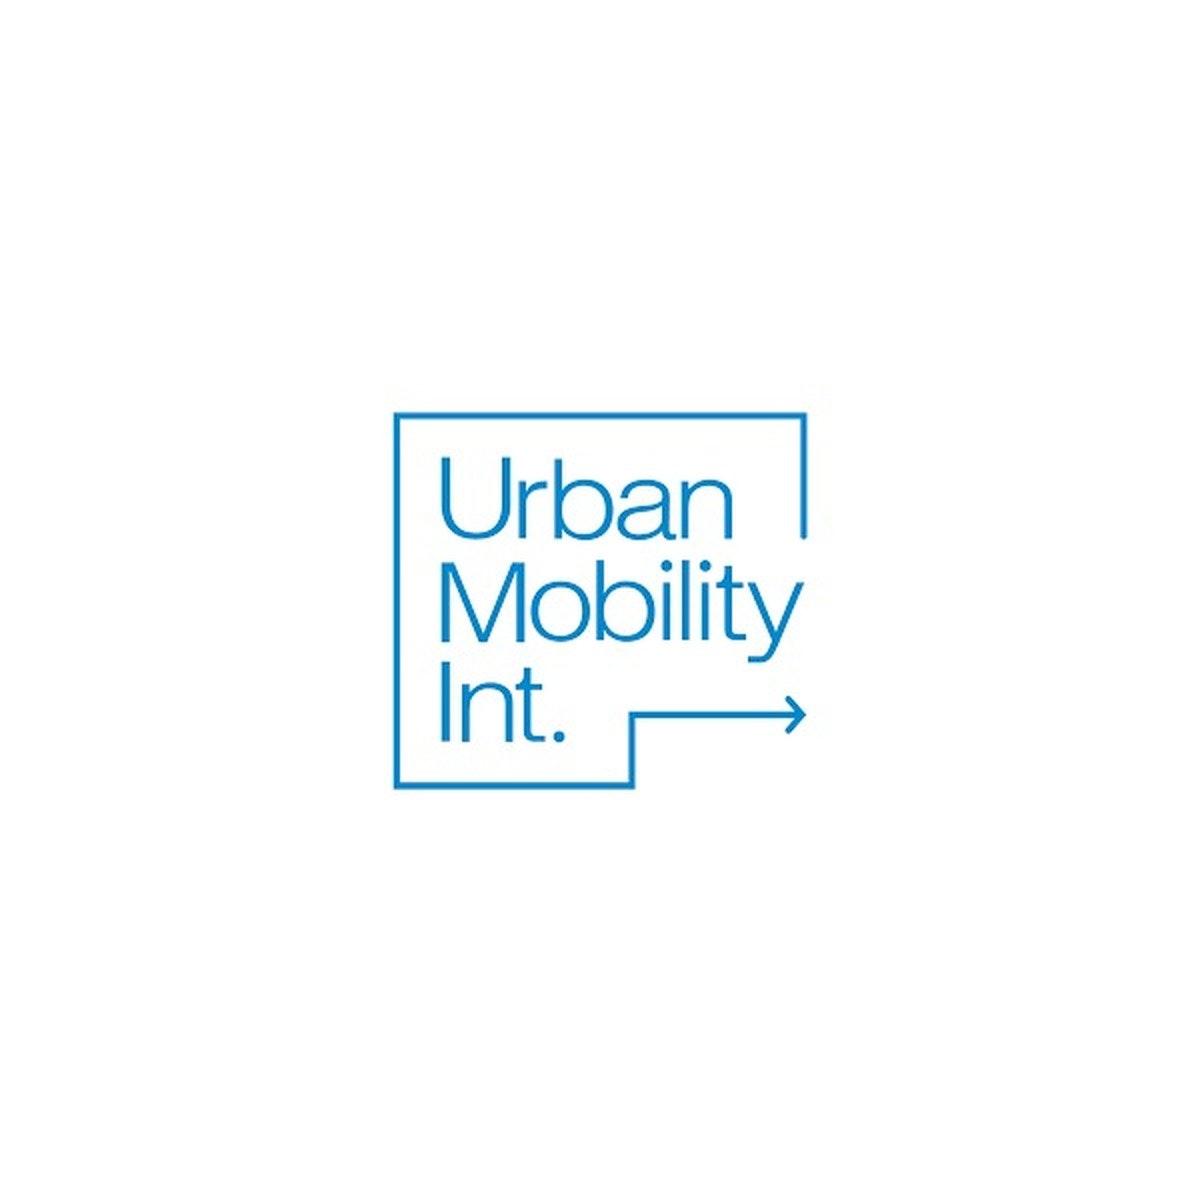 UMI Urban Mobility International GmbH